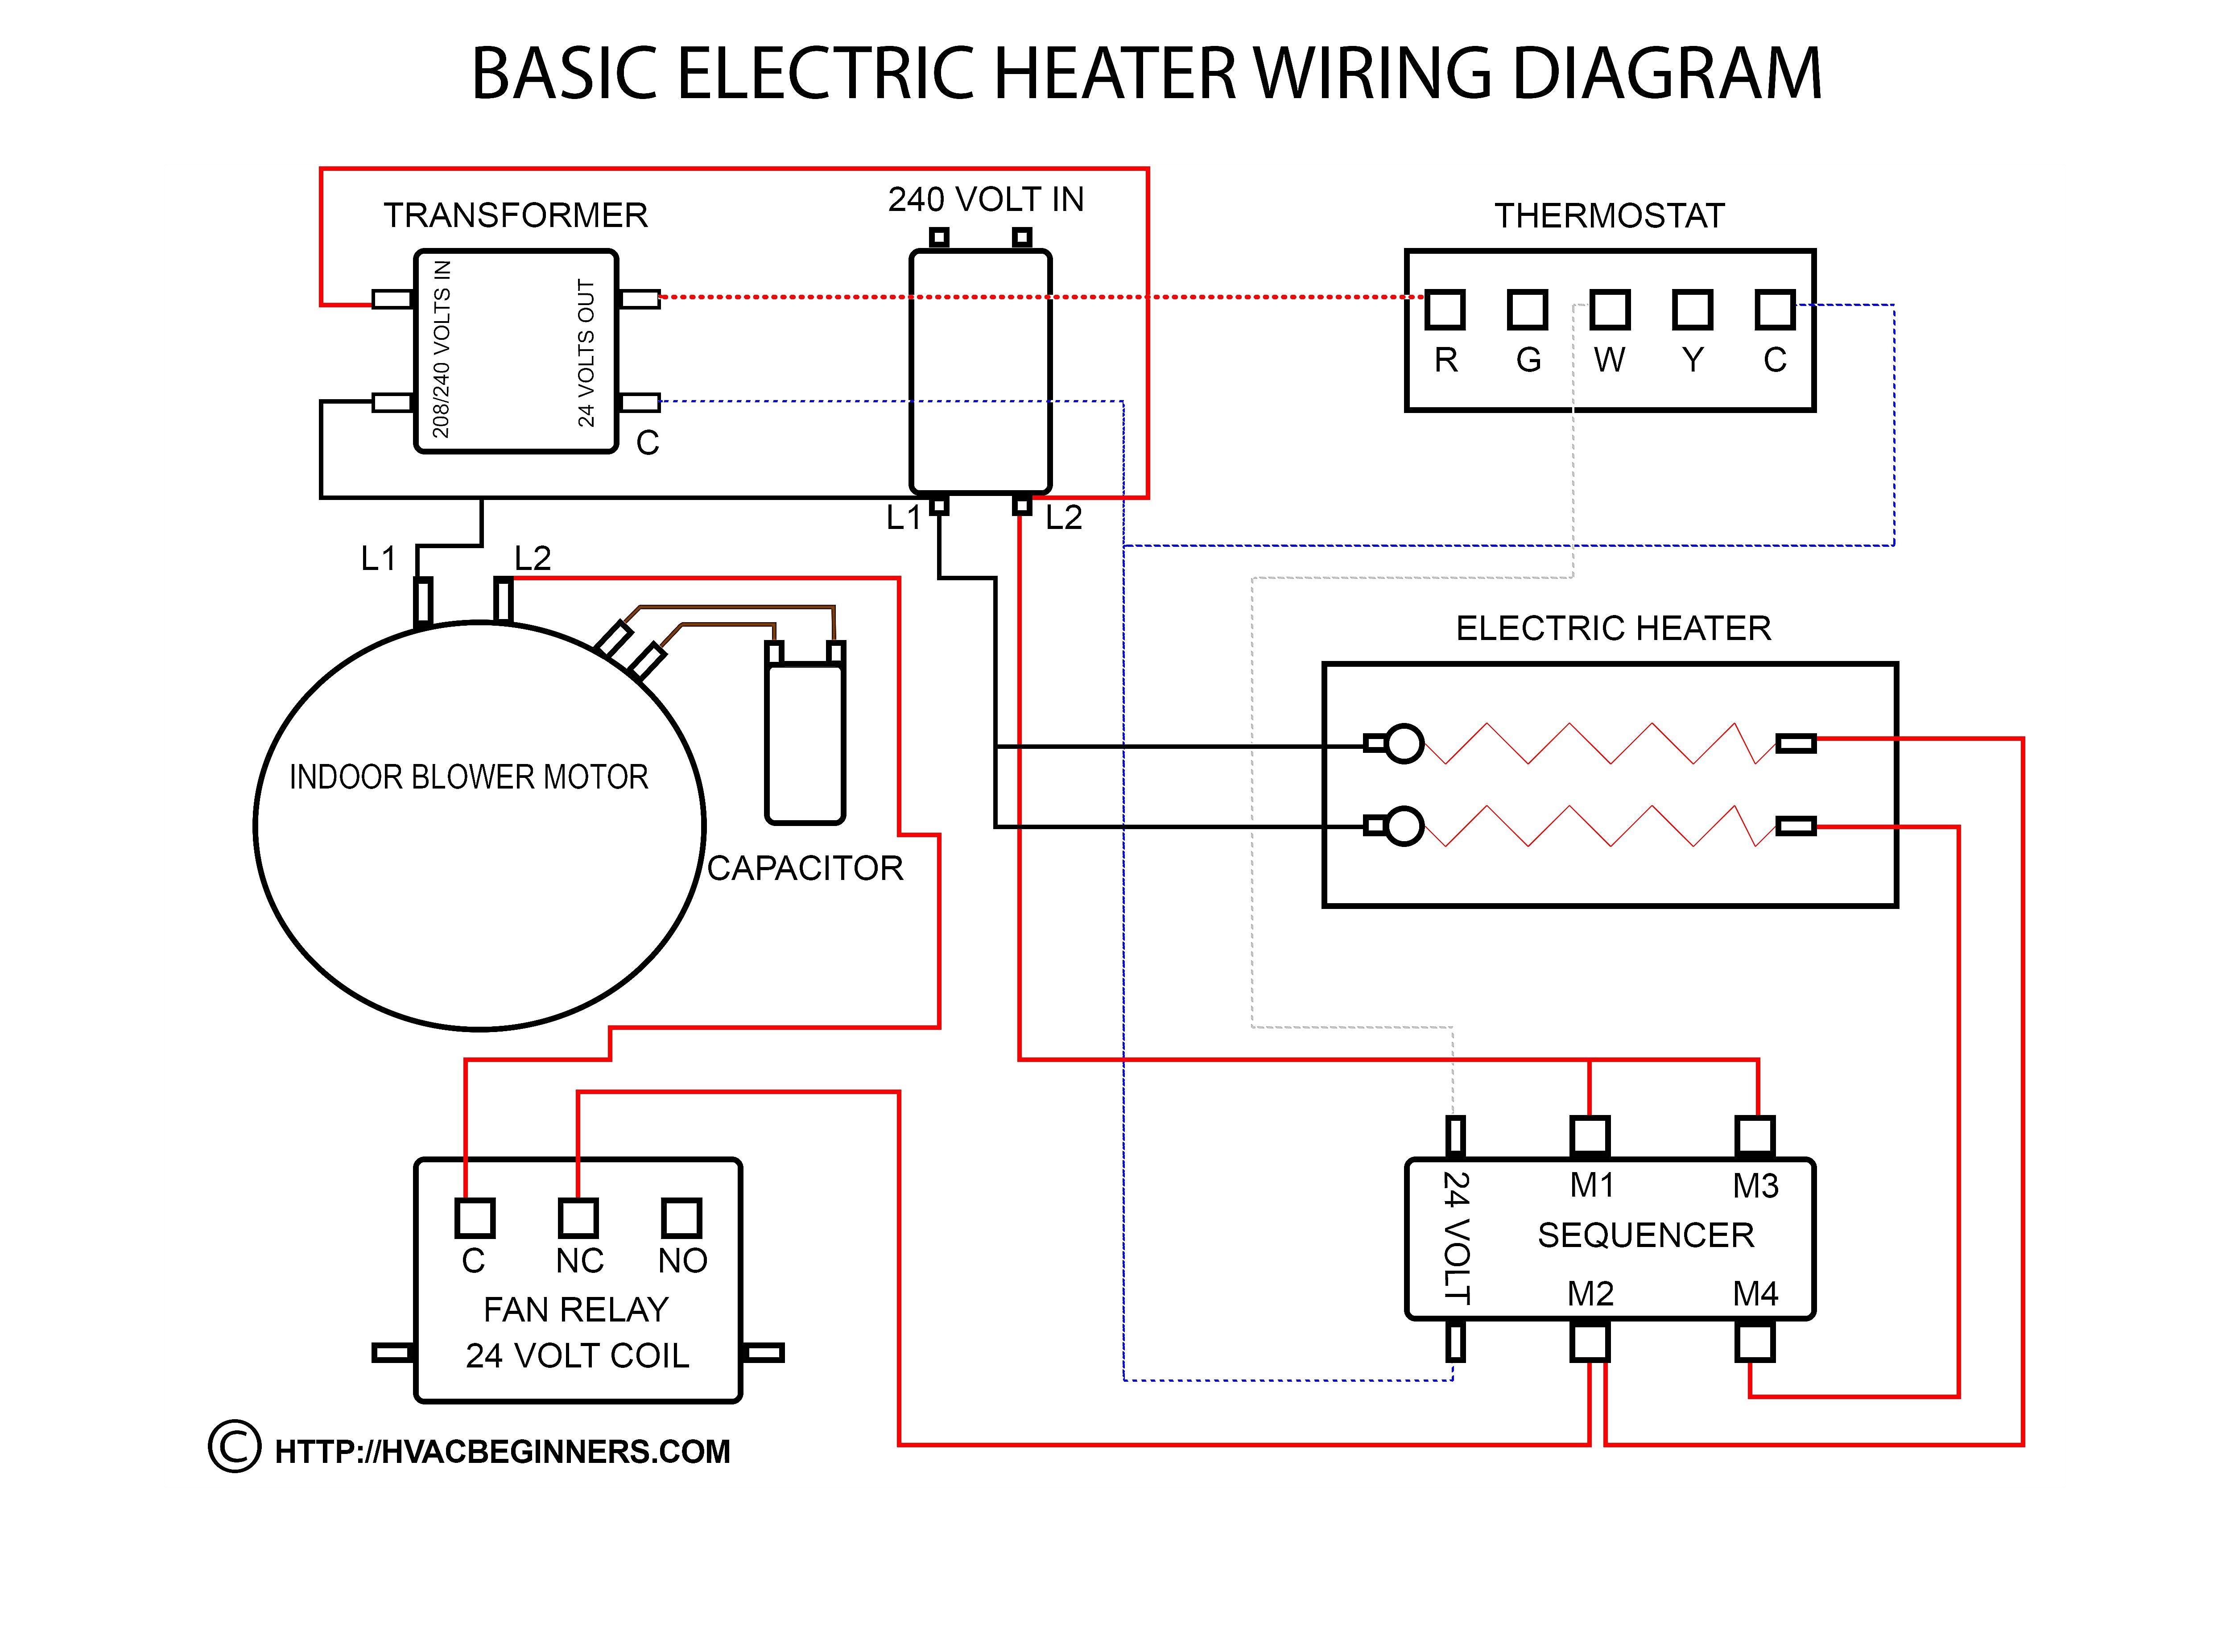 gas furnace thermostat wiring diagram Download-Luxury Gas Furnace Thermostat Wiring Diagram And 11-k